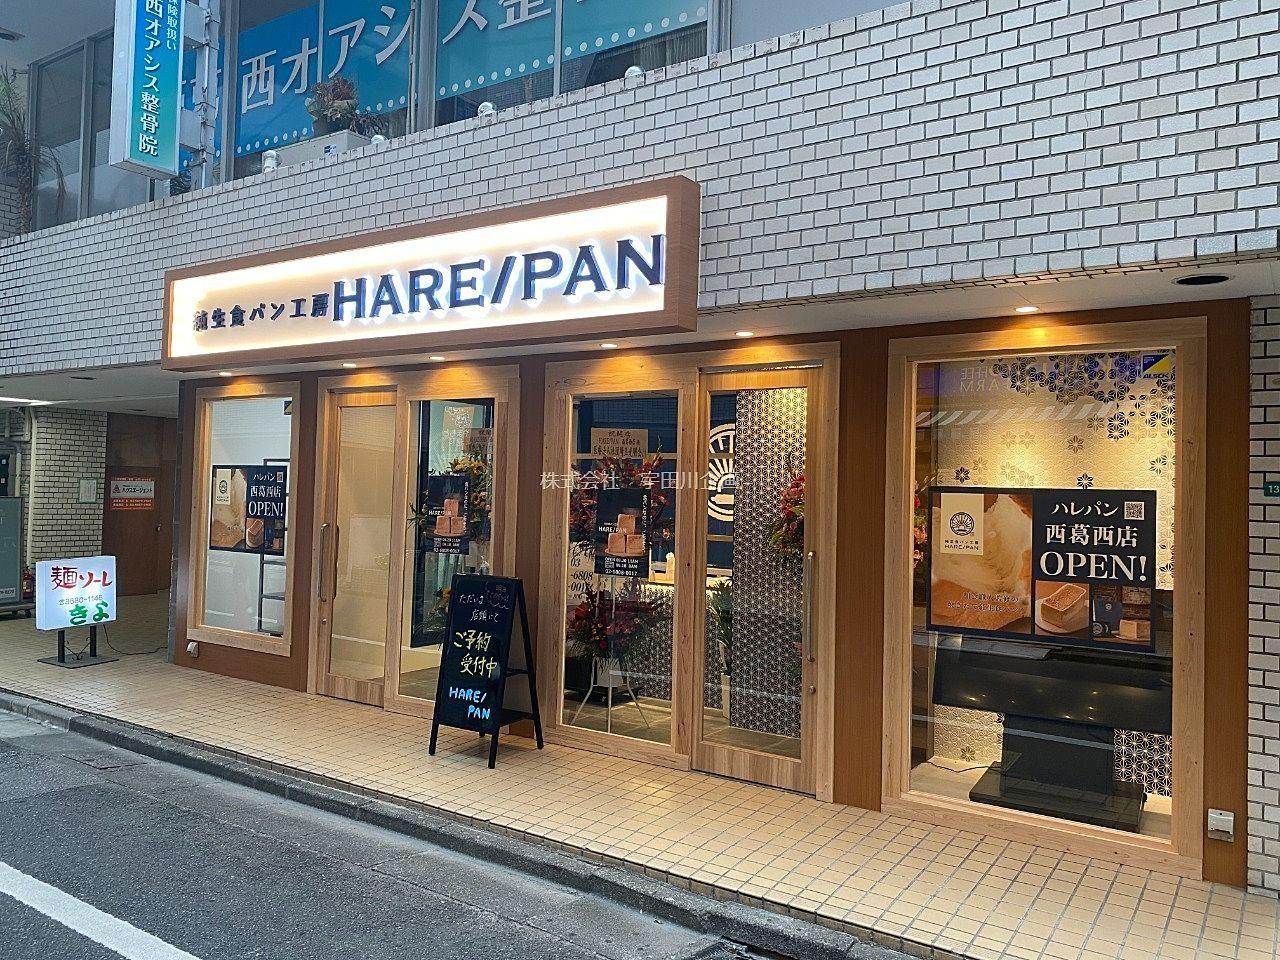 HARE/PANで食パンを買ってみた